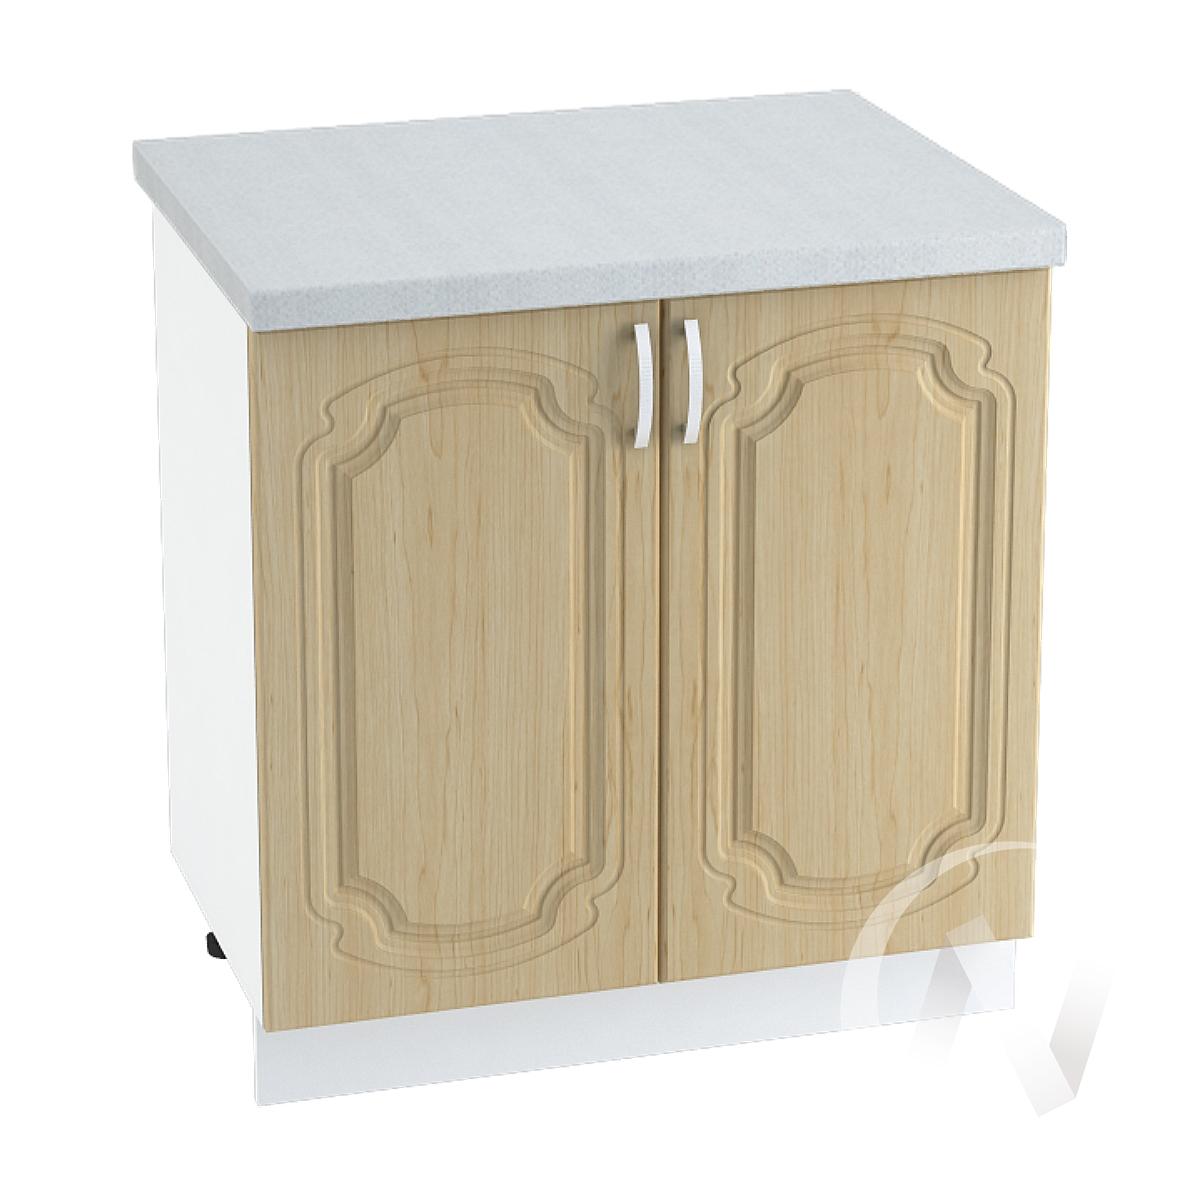 "Кухня ""Настя"": Шкаф нижний 800, ШН 800 (Береза/корпус белый)"